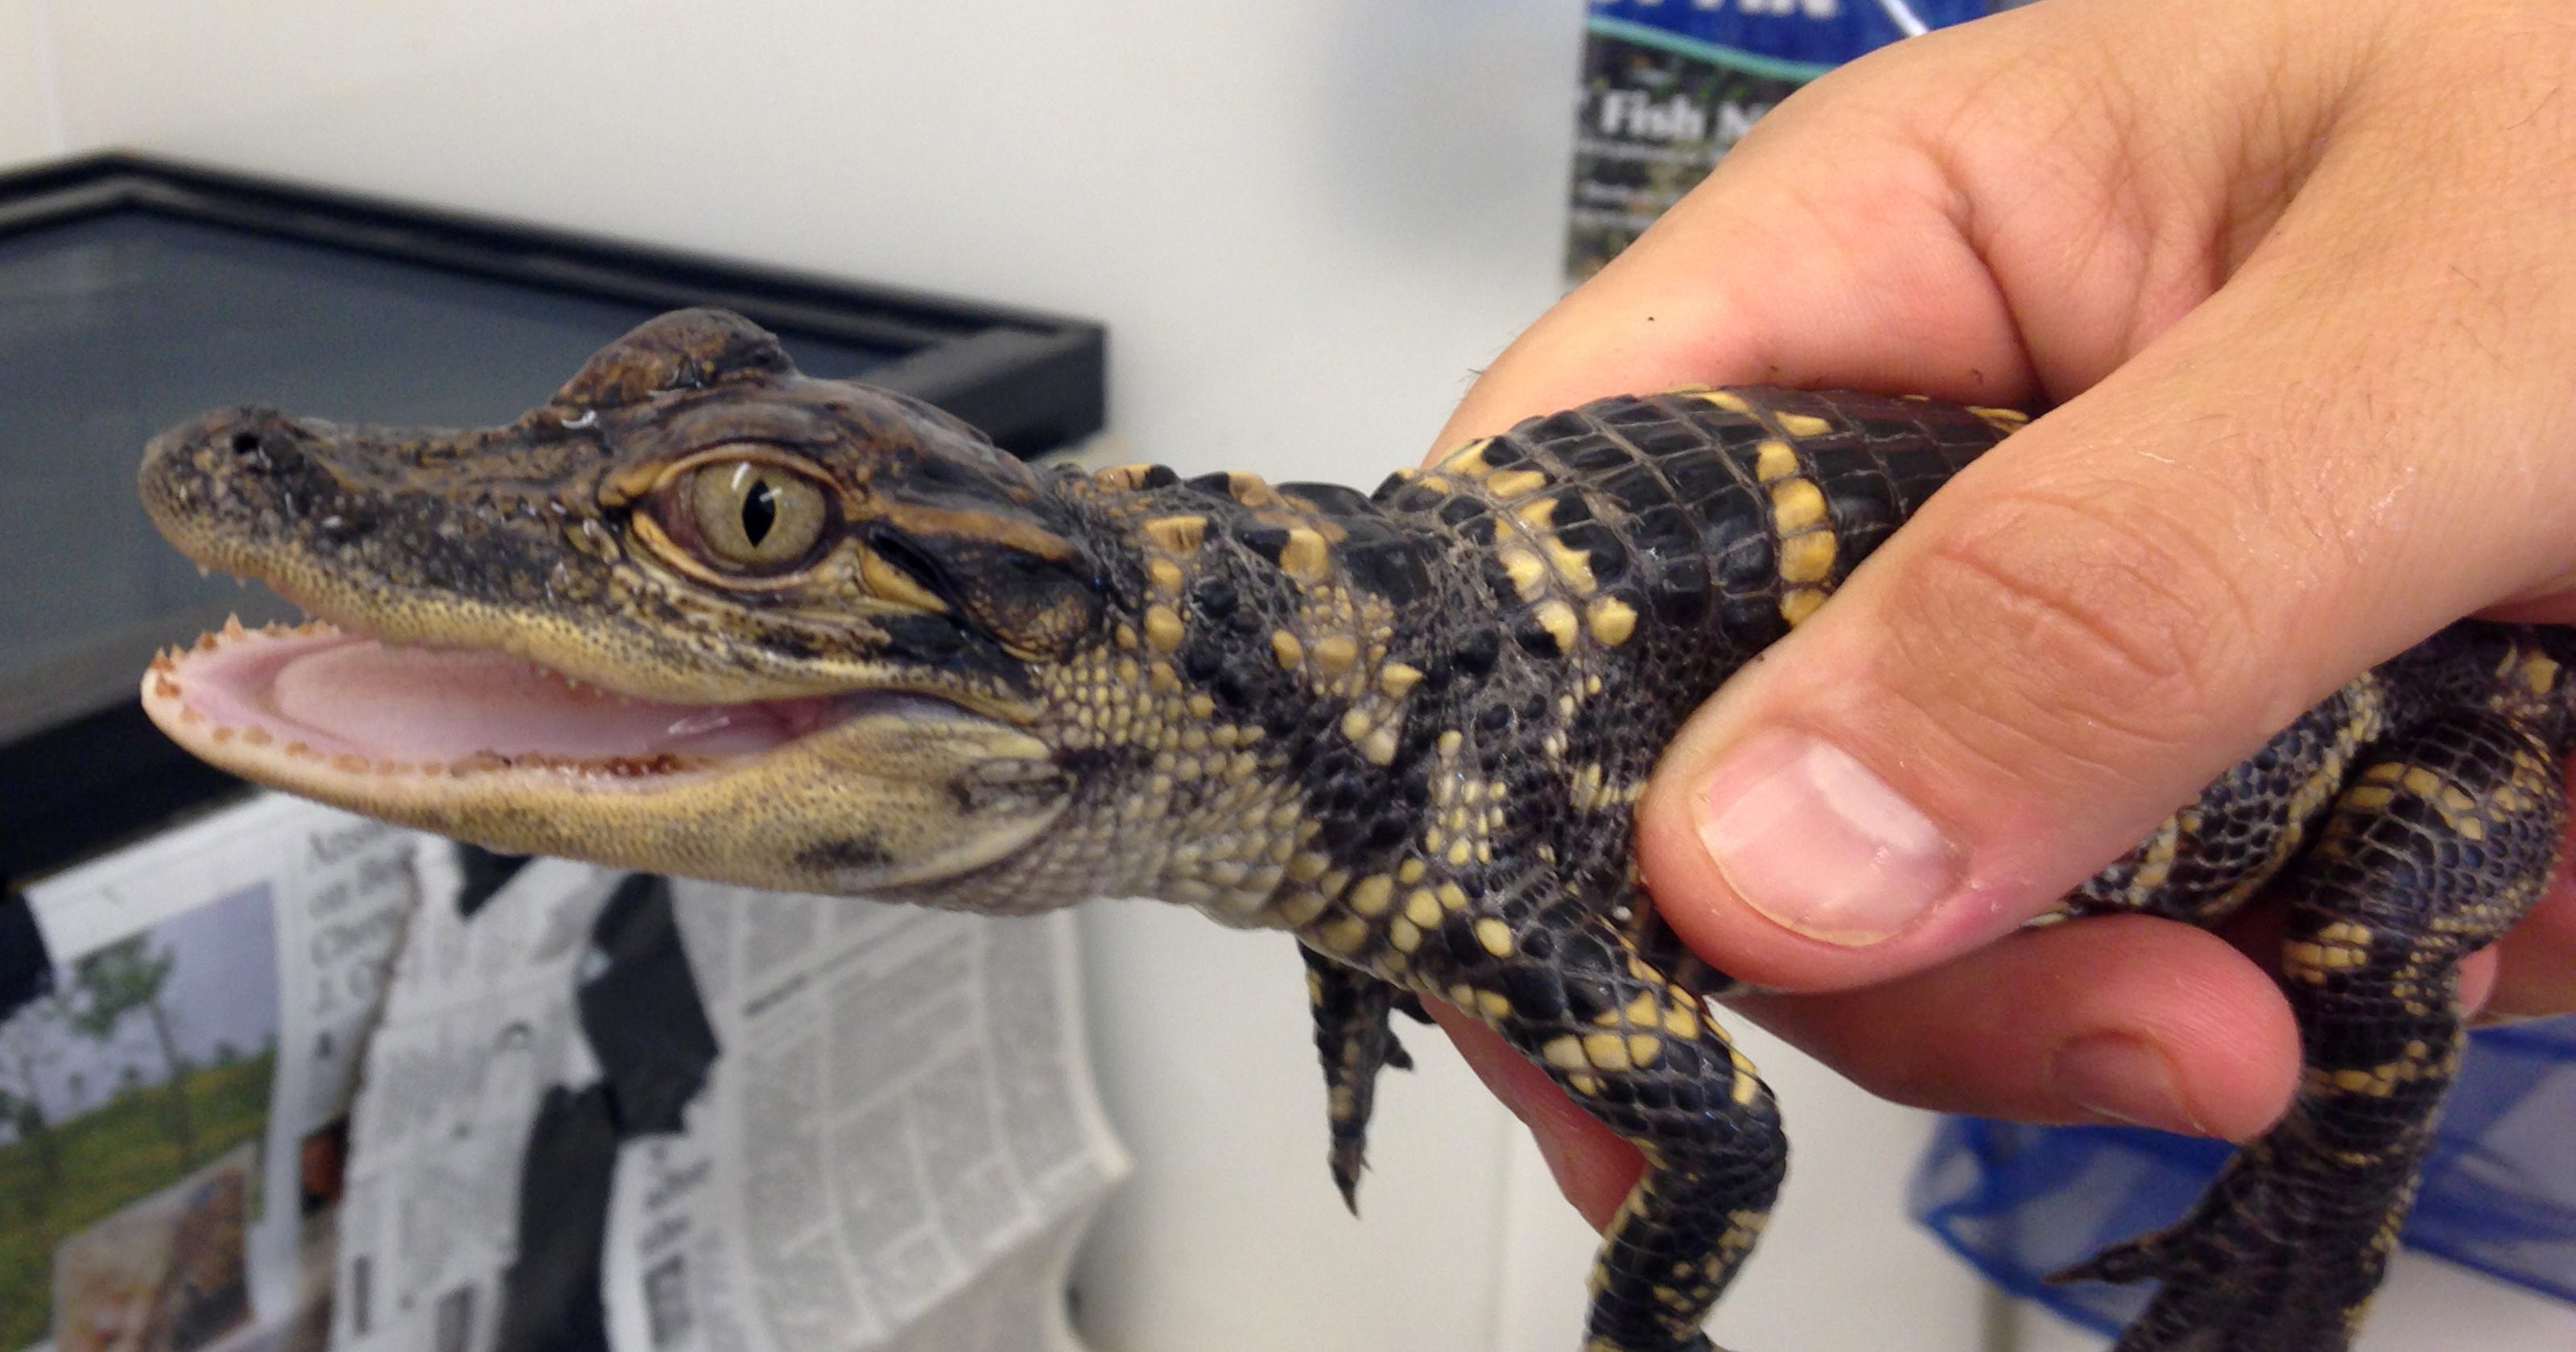 State seizes baby alligator in Clyde